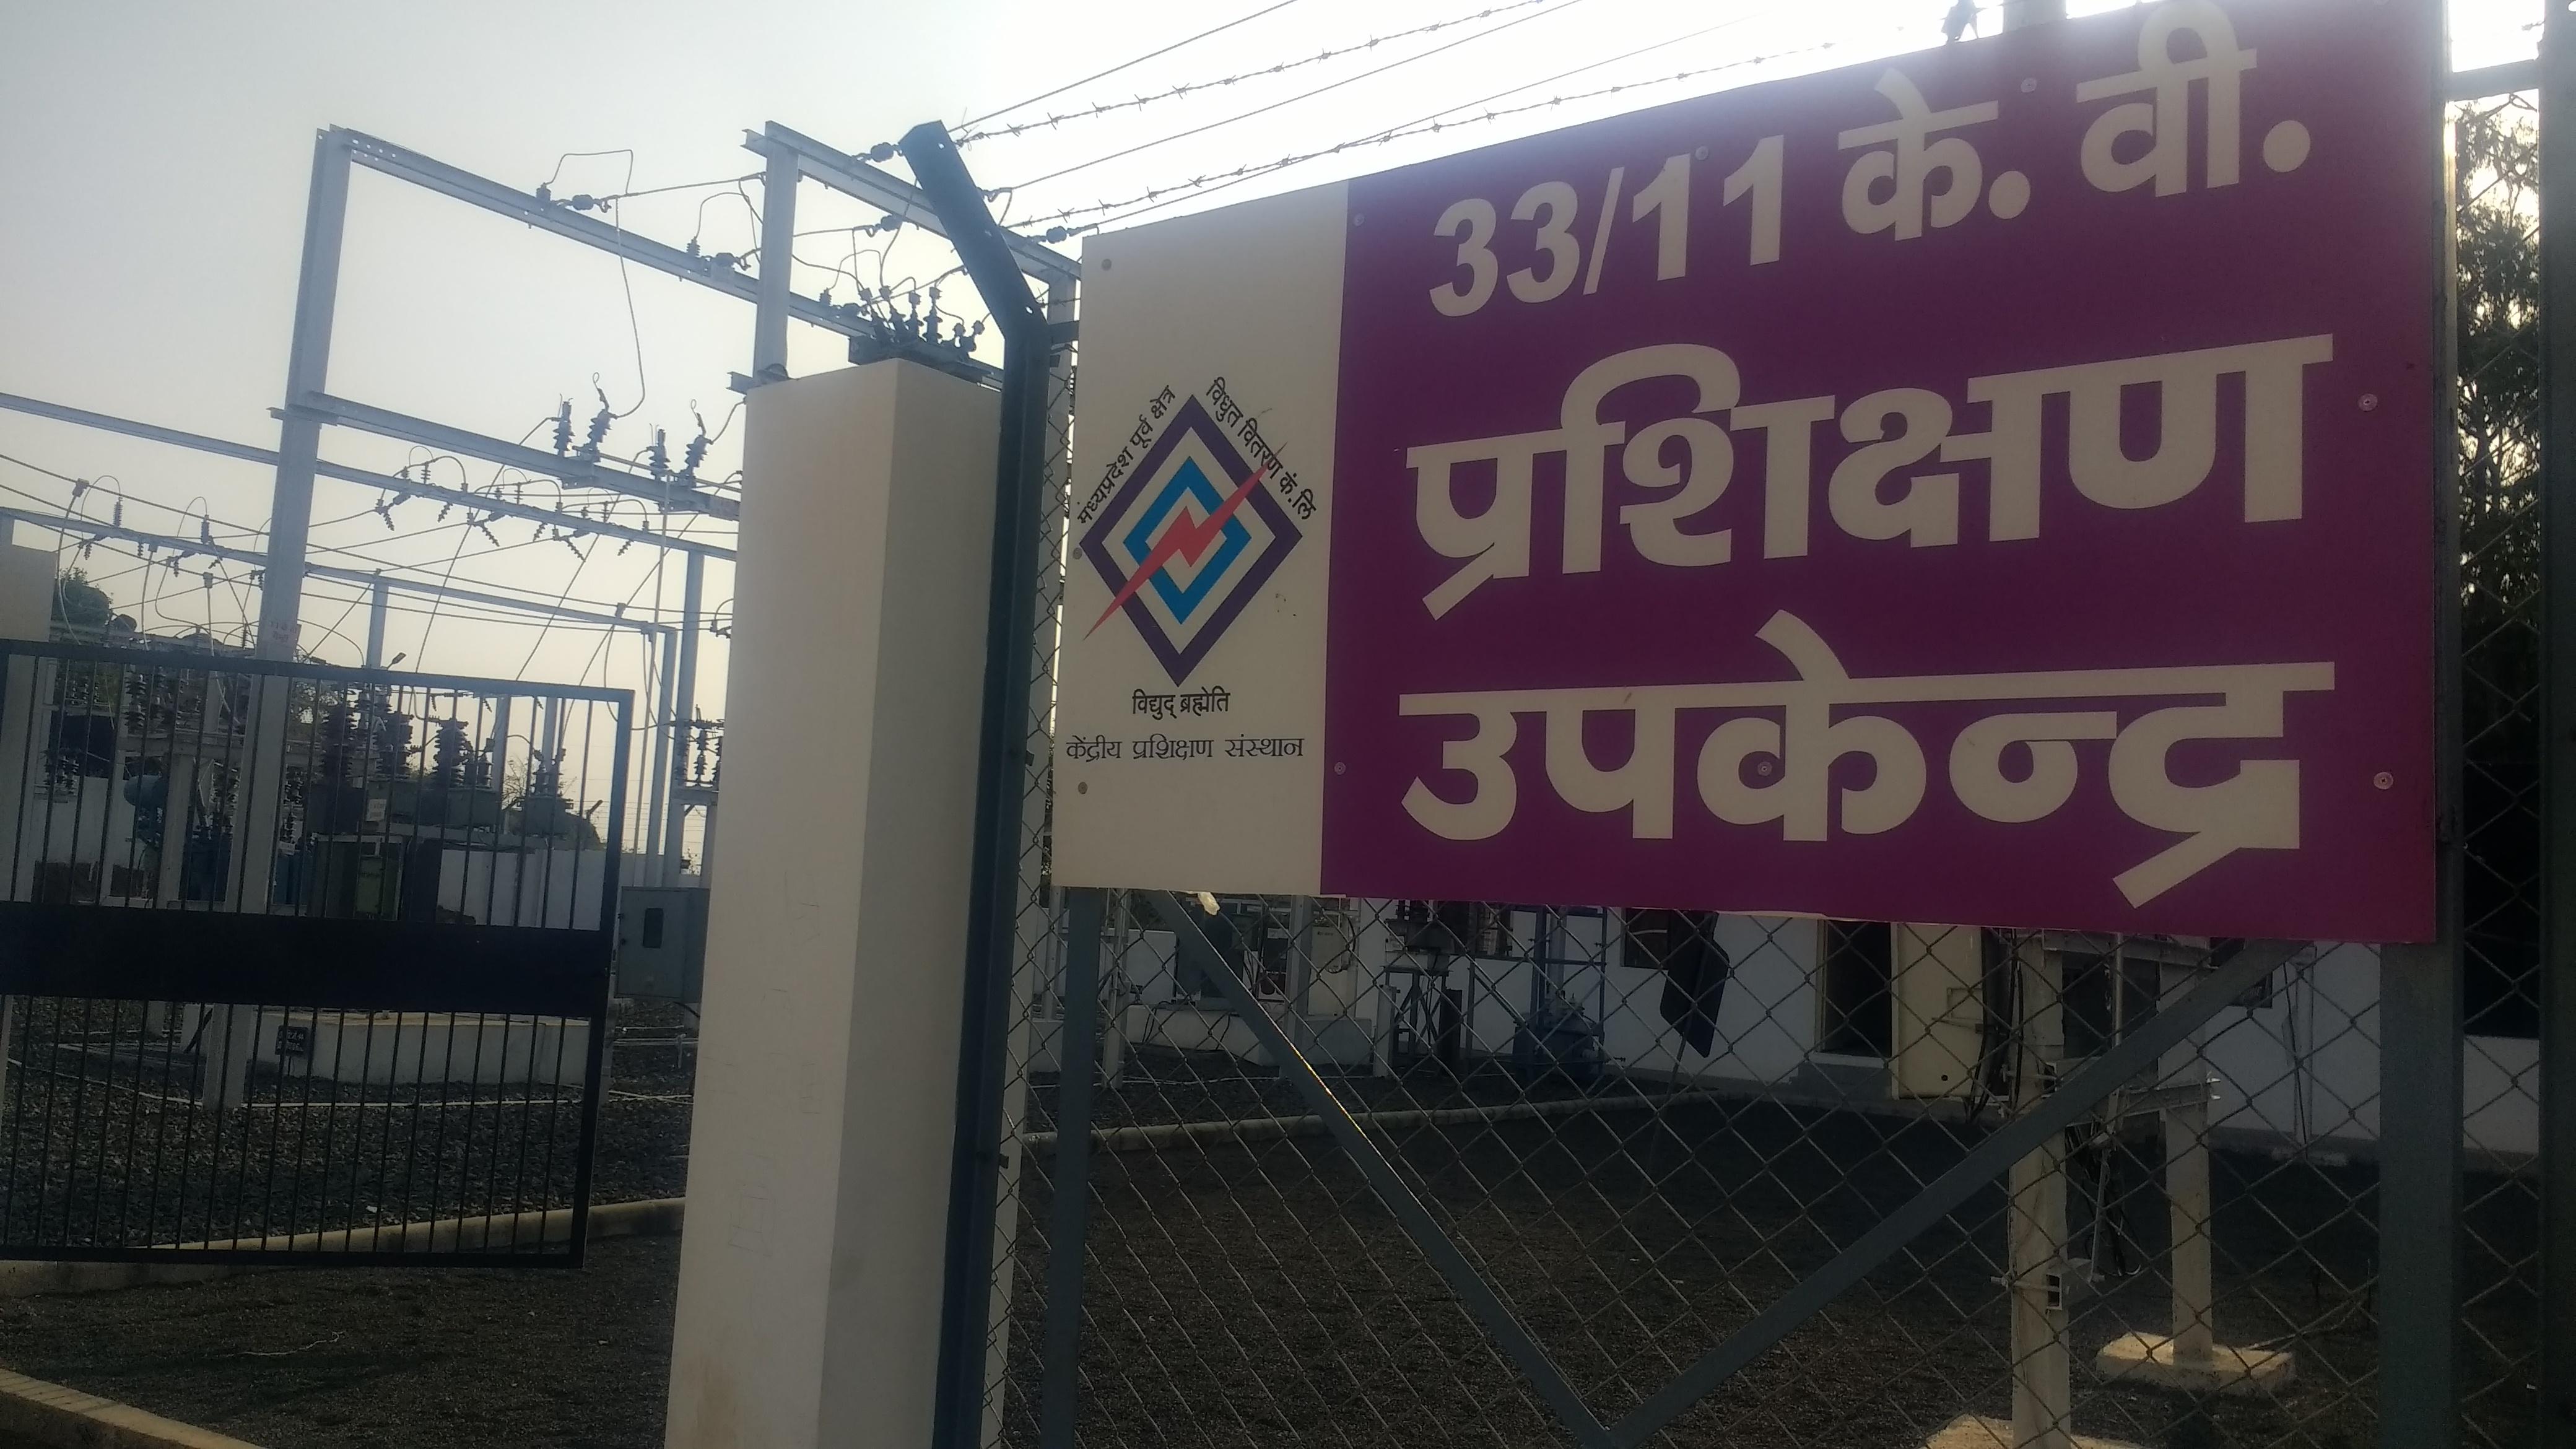 Central Training Institute Jabalpur - Wikipedia